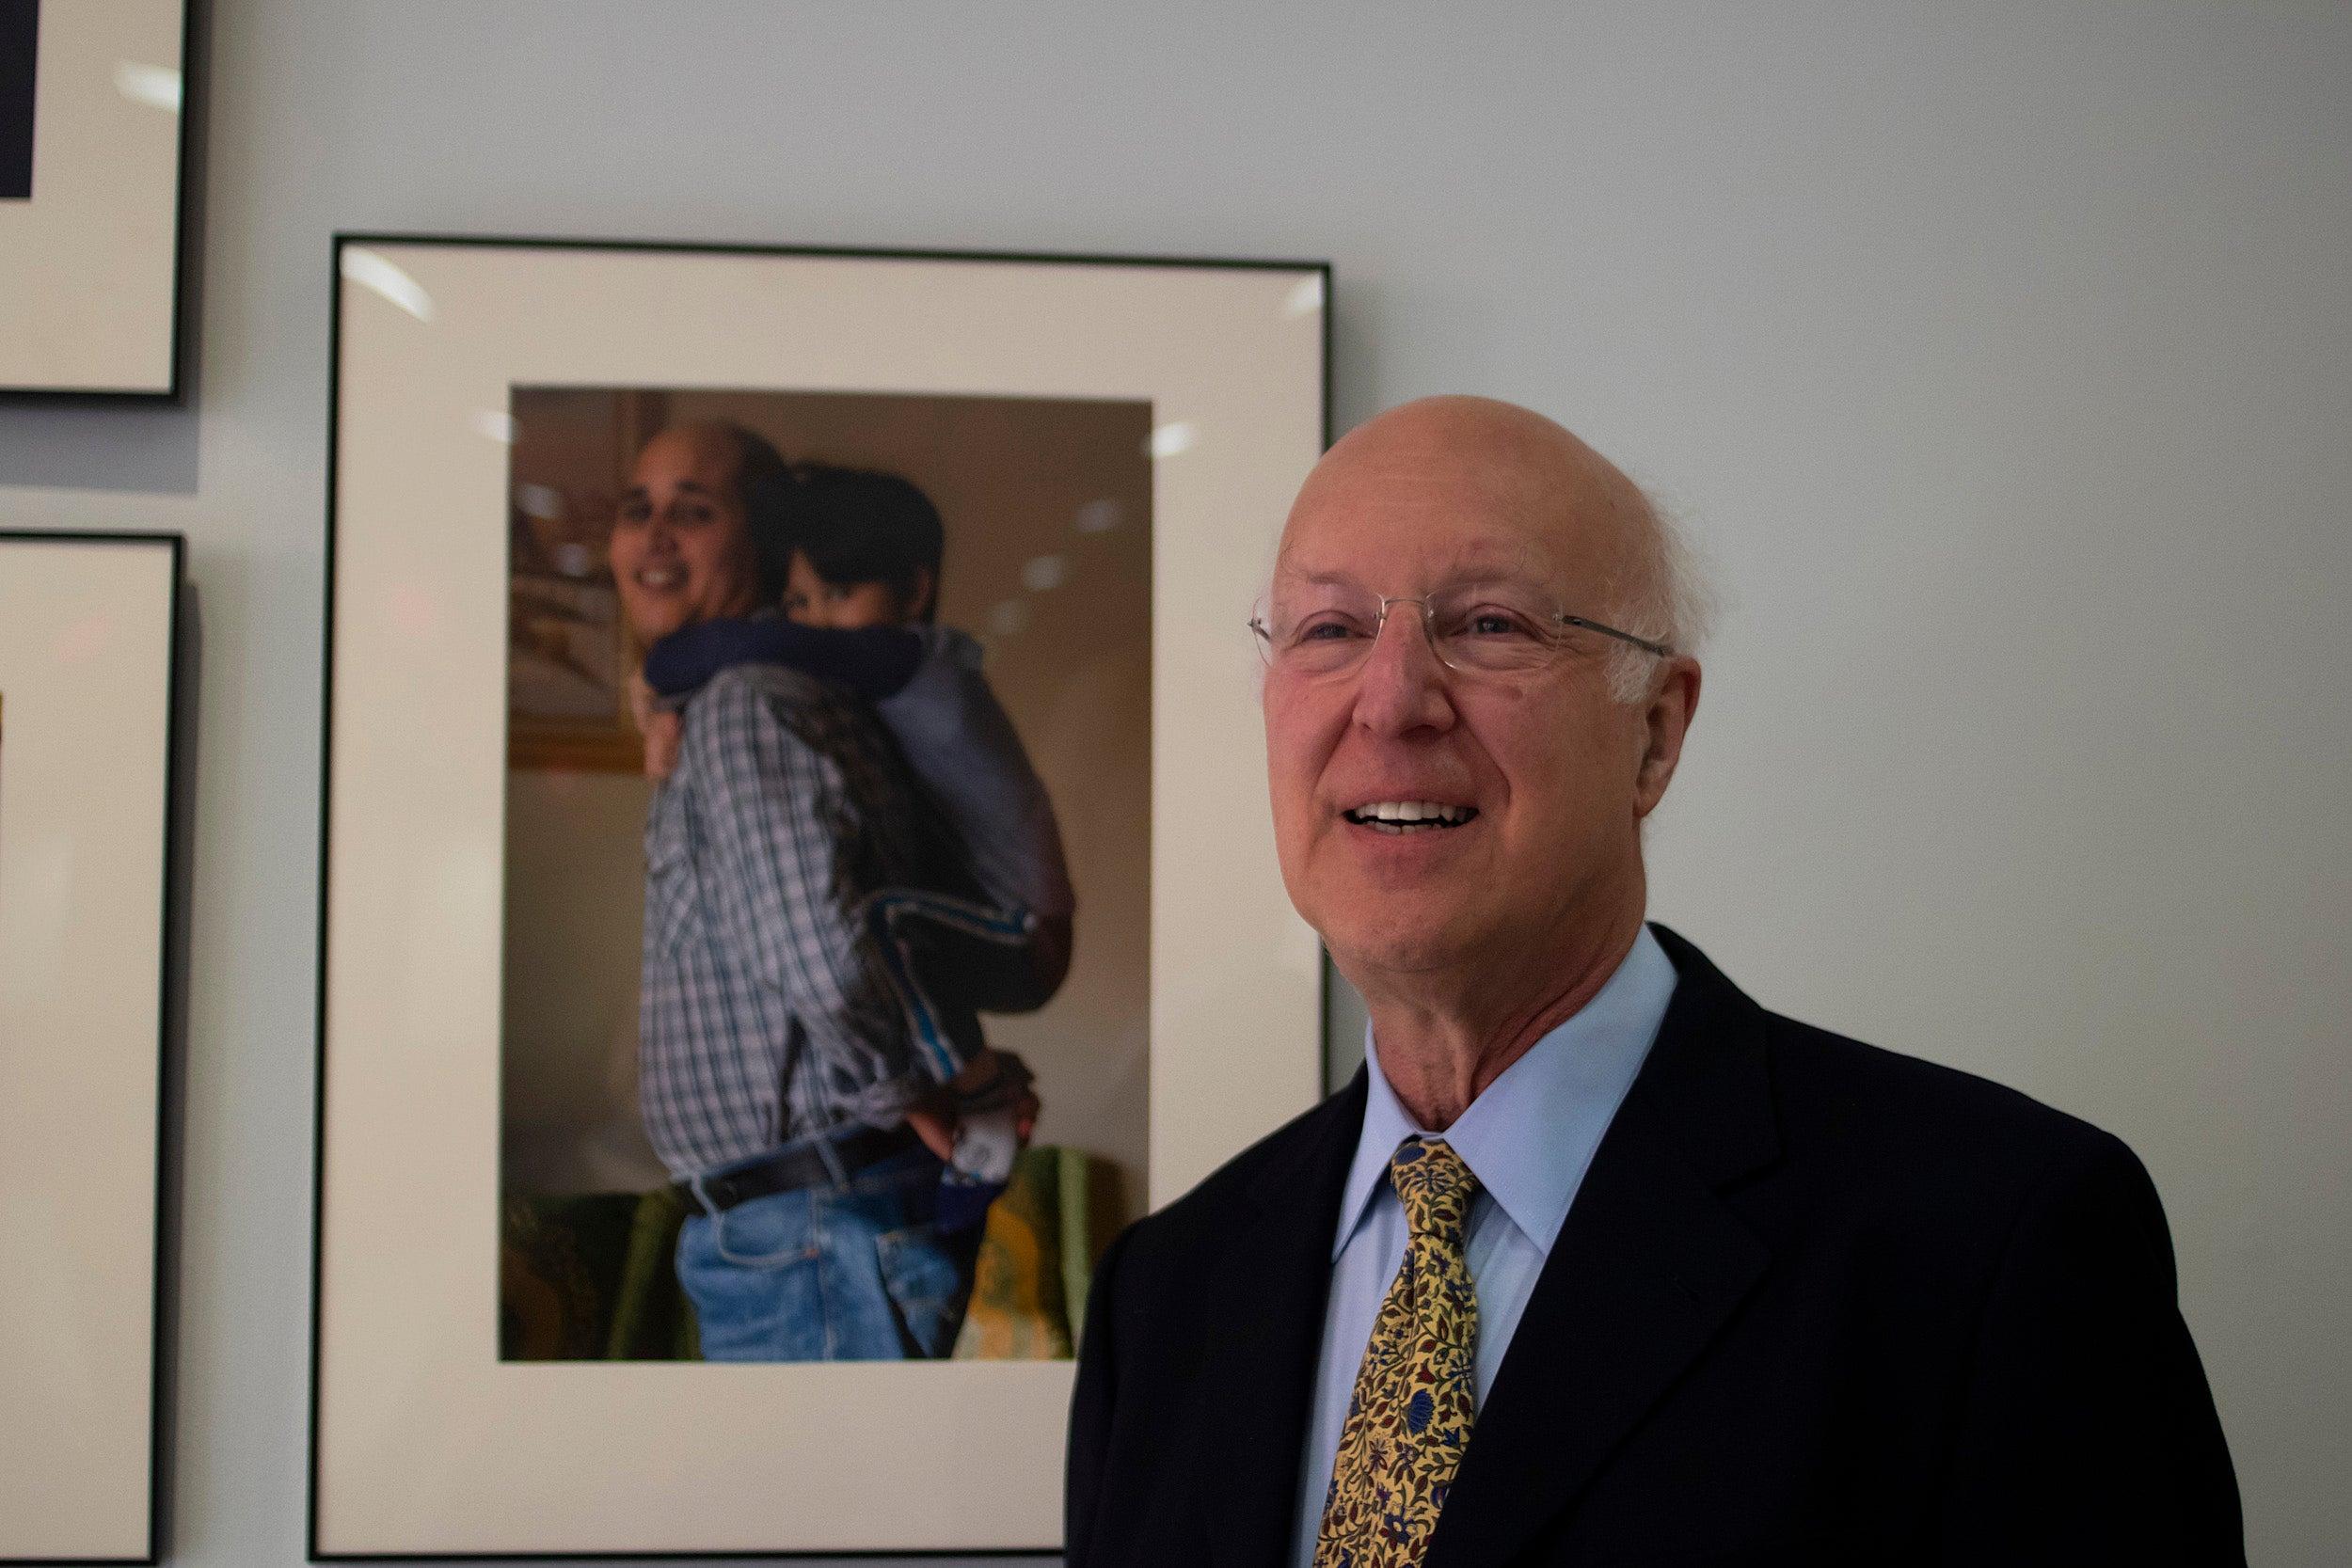 Julian Fisher, a pediatrician and neurologist